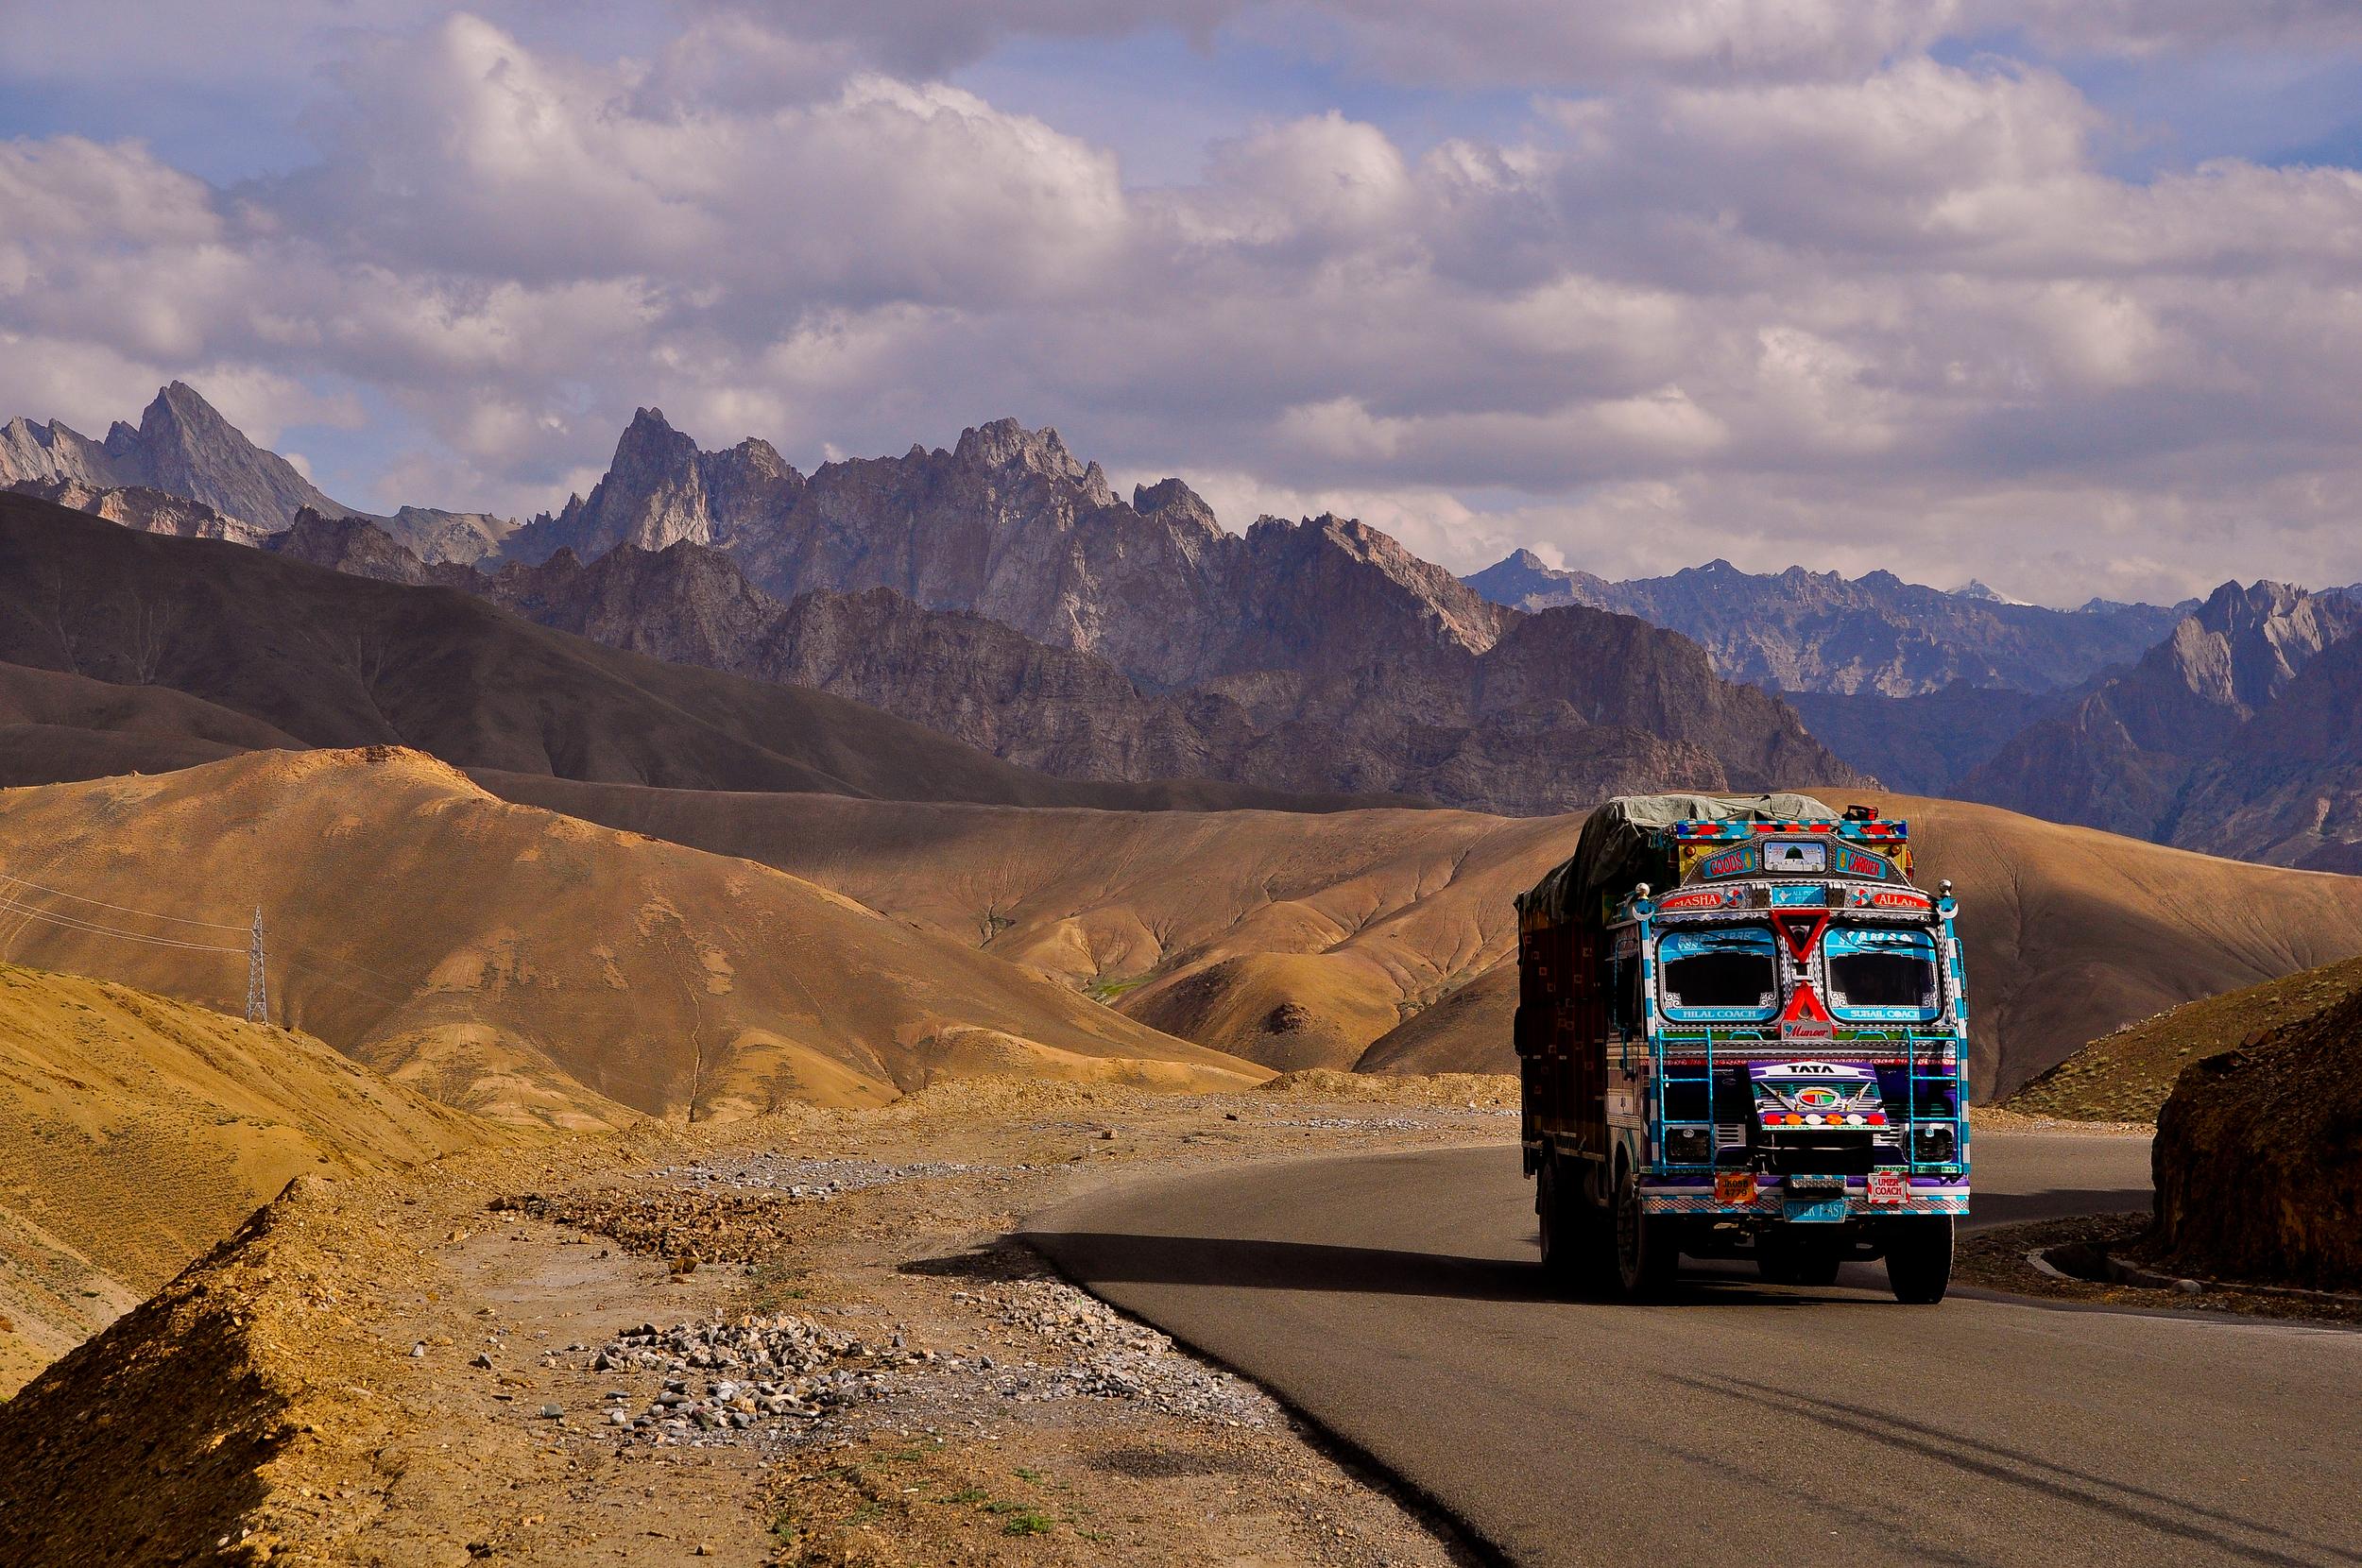 Kargil Truck.jpg